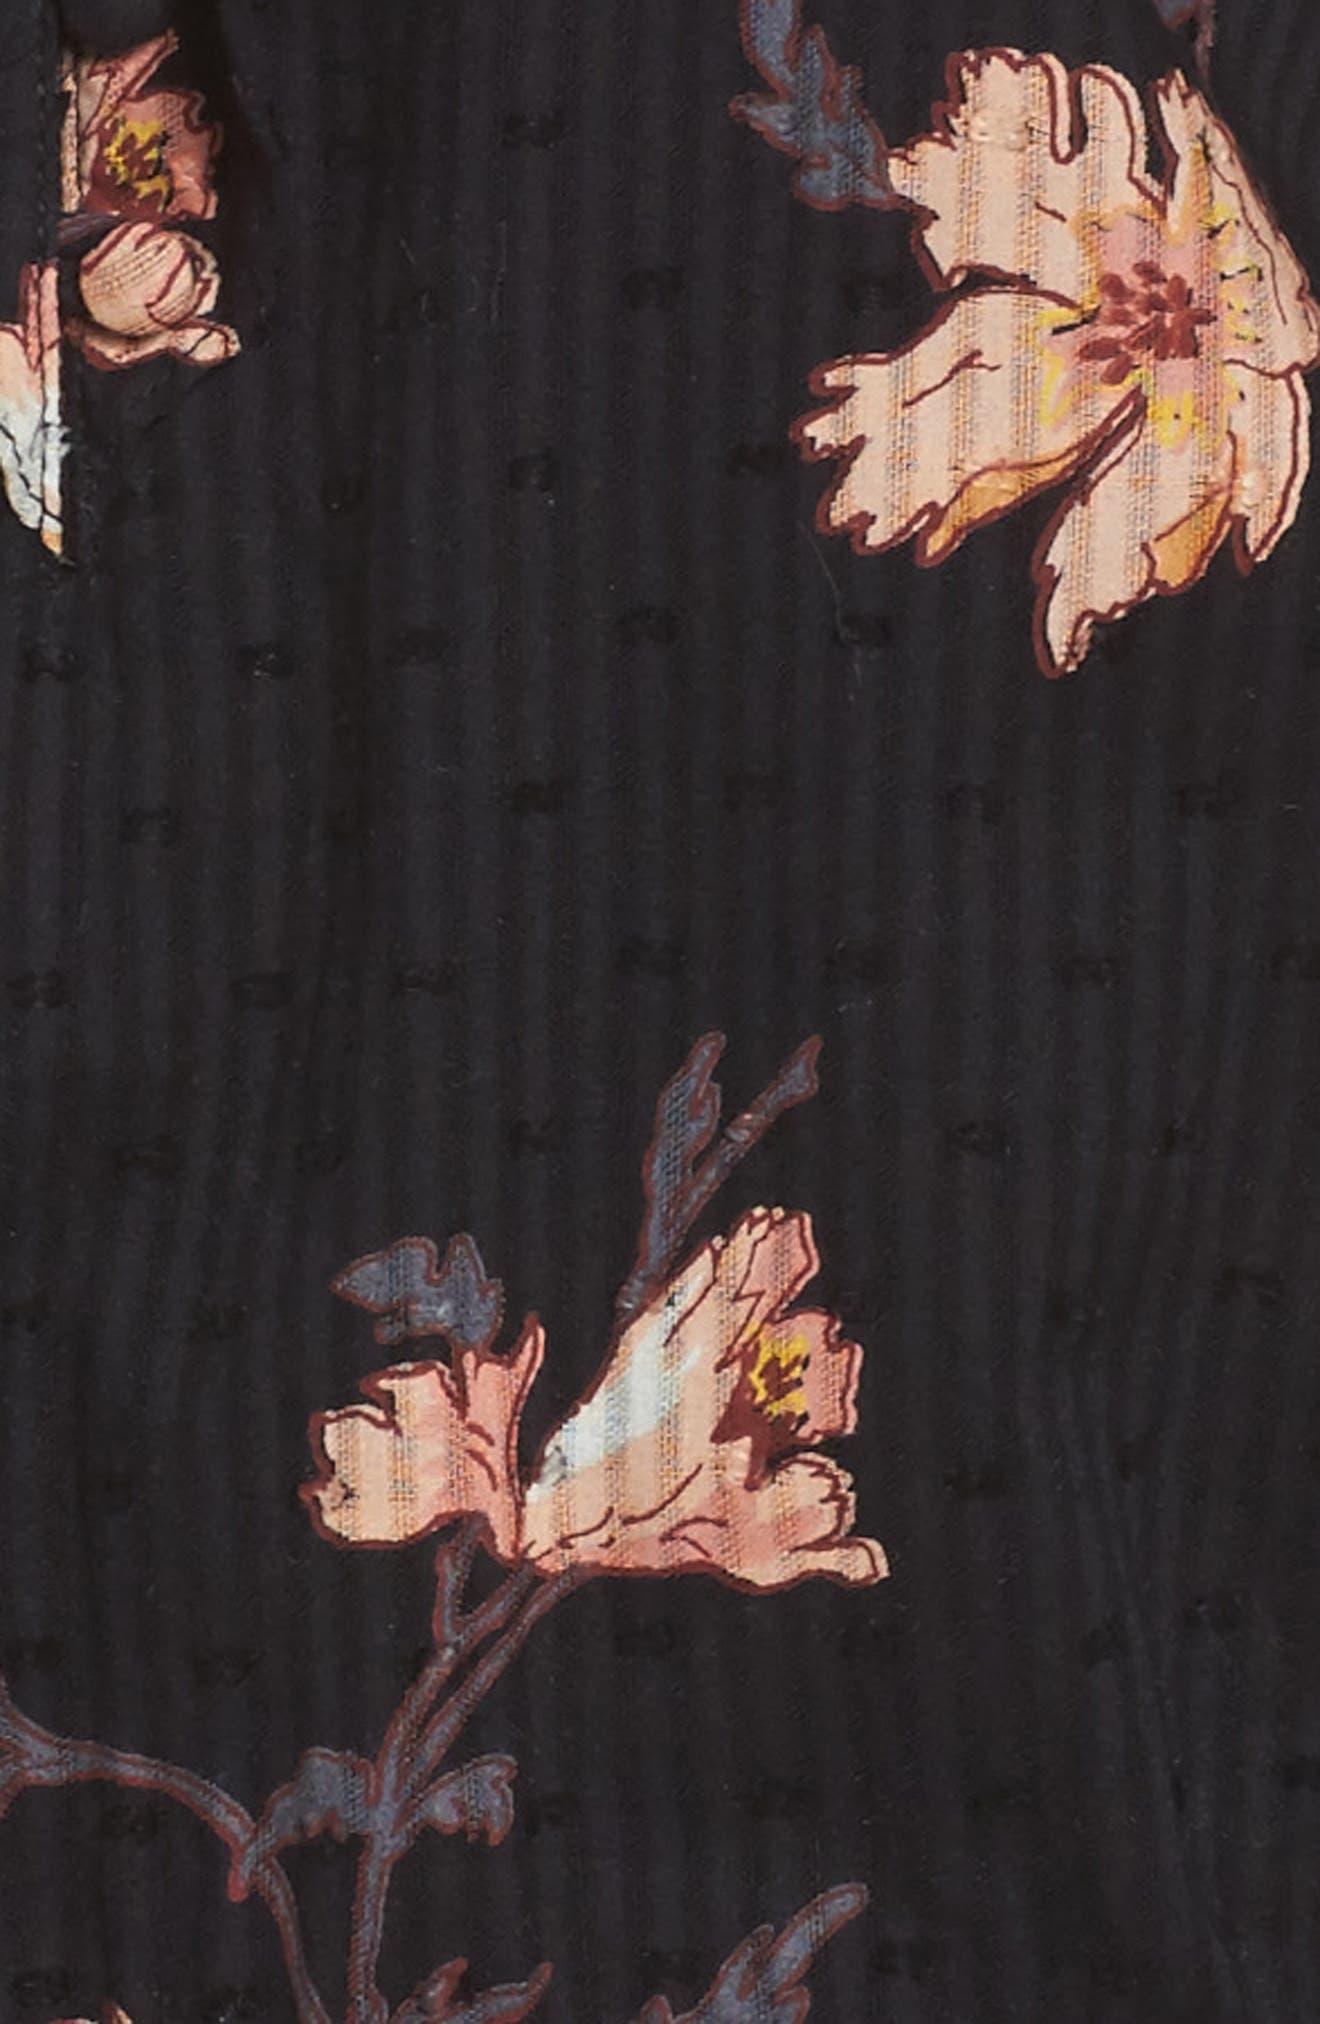 Farfella Floral Print Ruffle Minidress,                             Alternate thumbnail 5, color,                             Black Sunrise